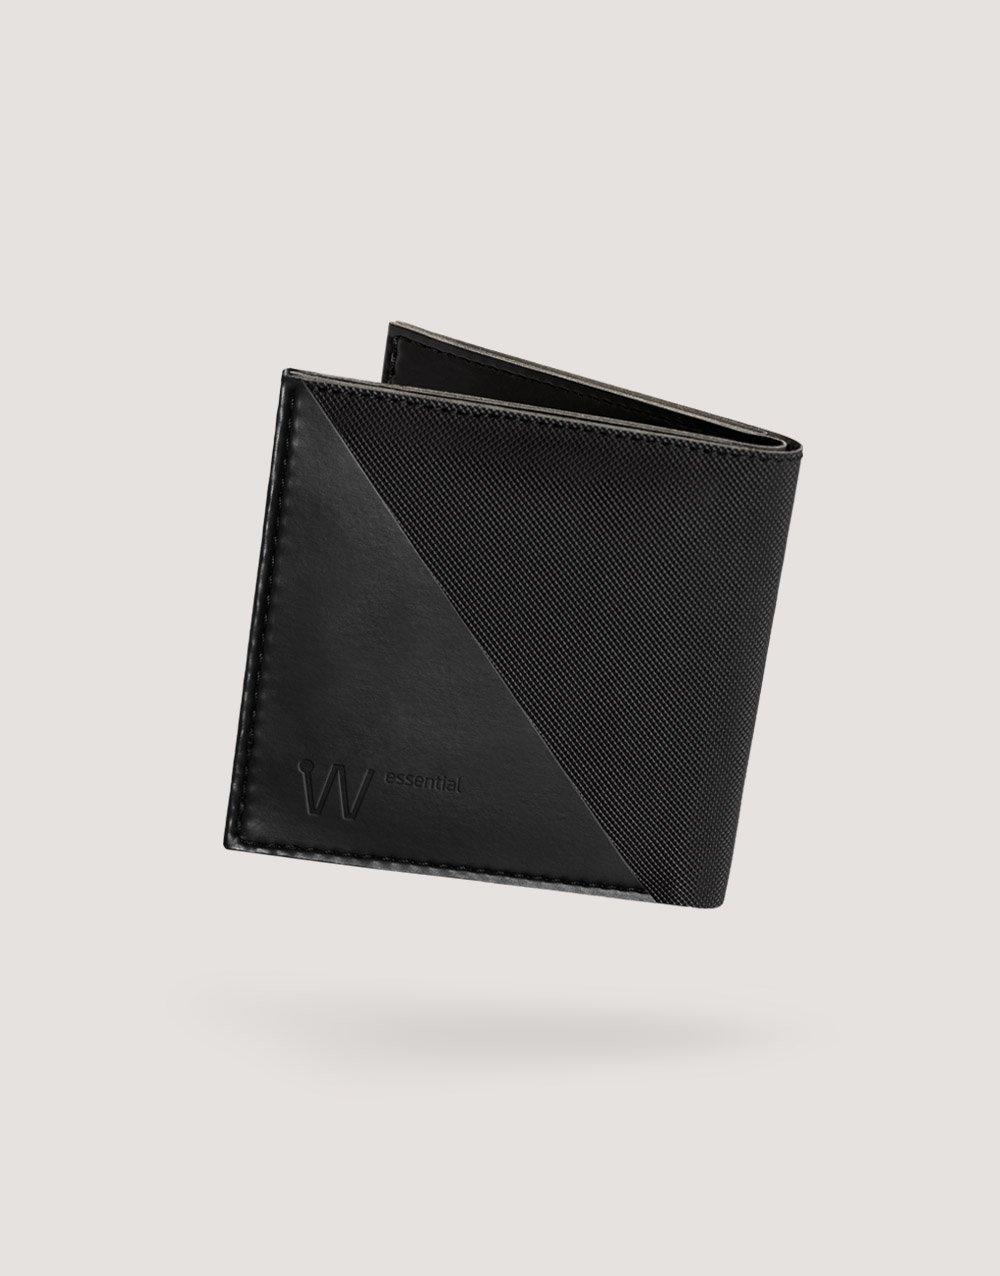 Baggizmo Wiseward Essential RFID protected wallet in jet black color